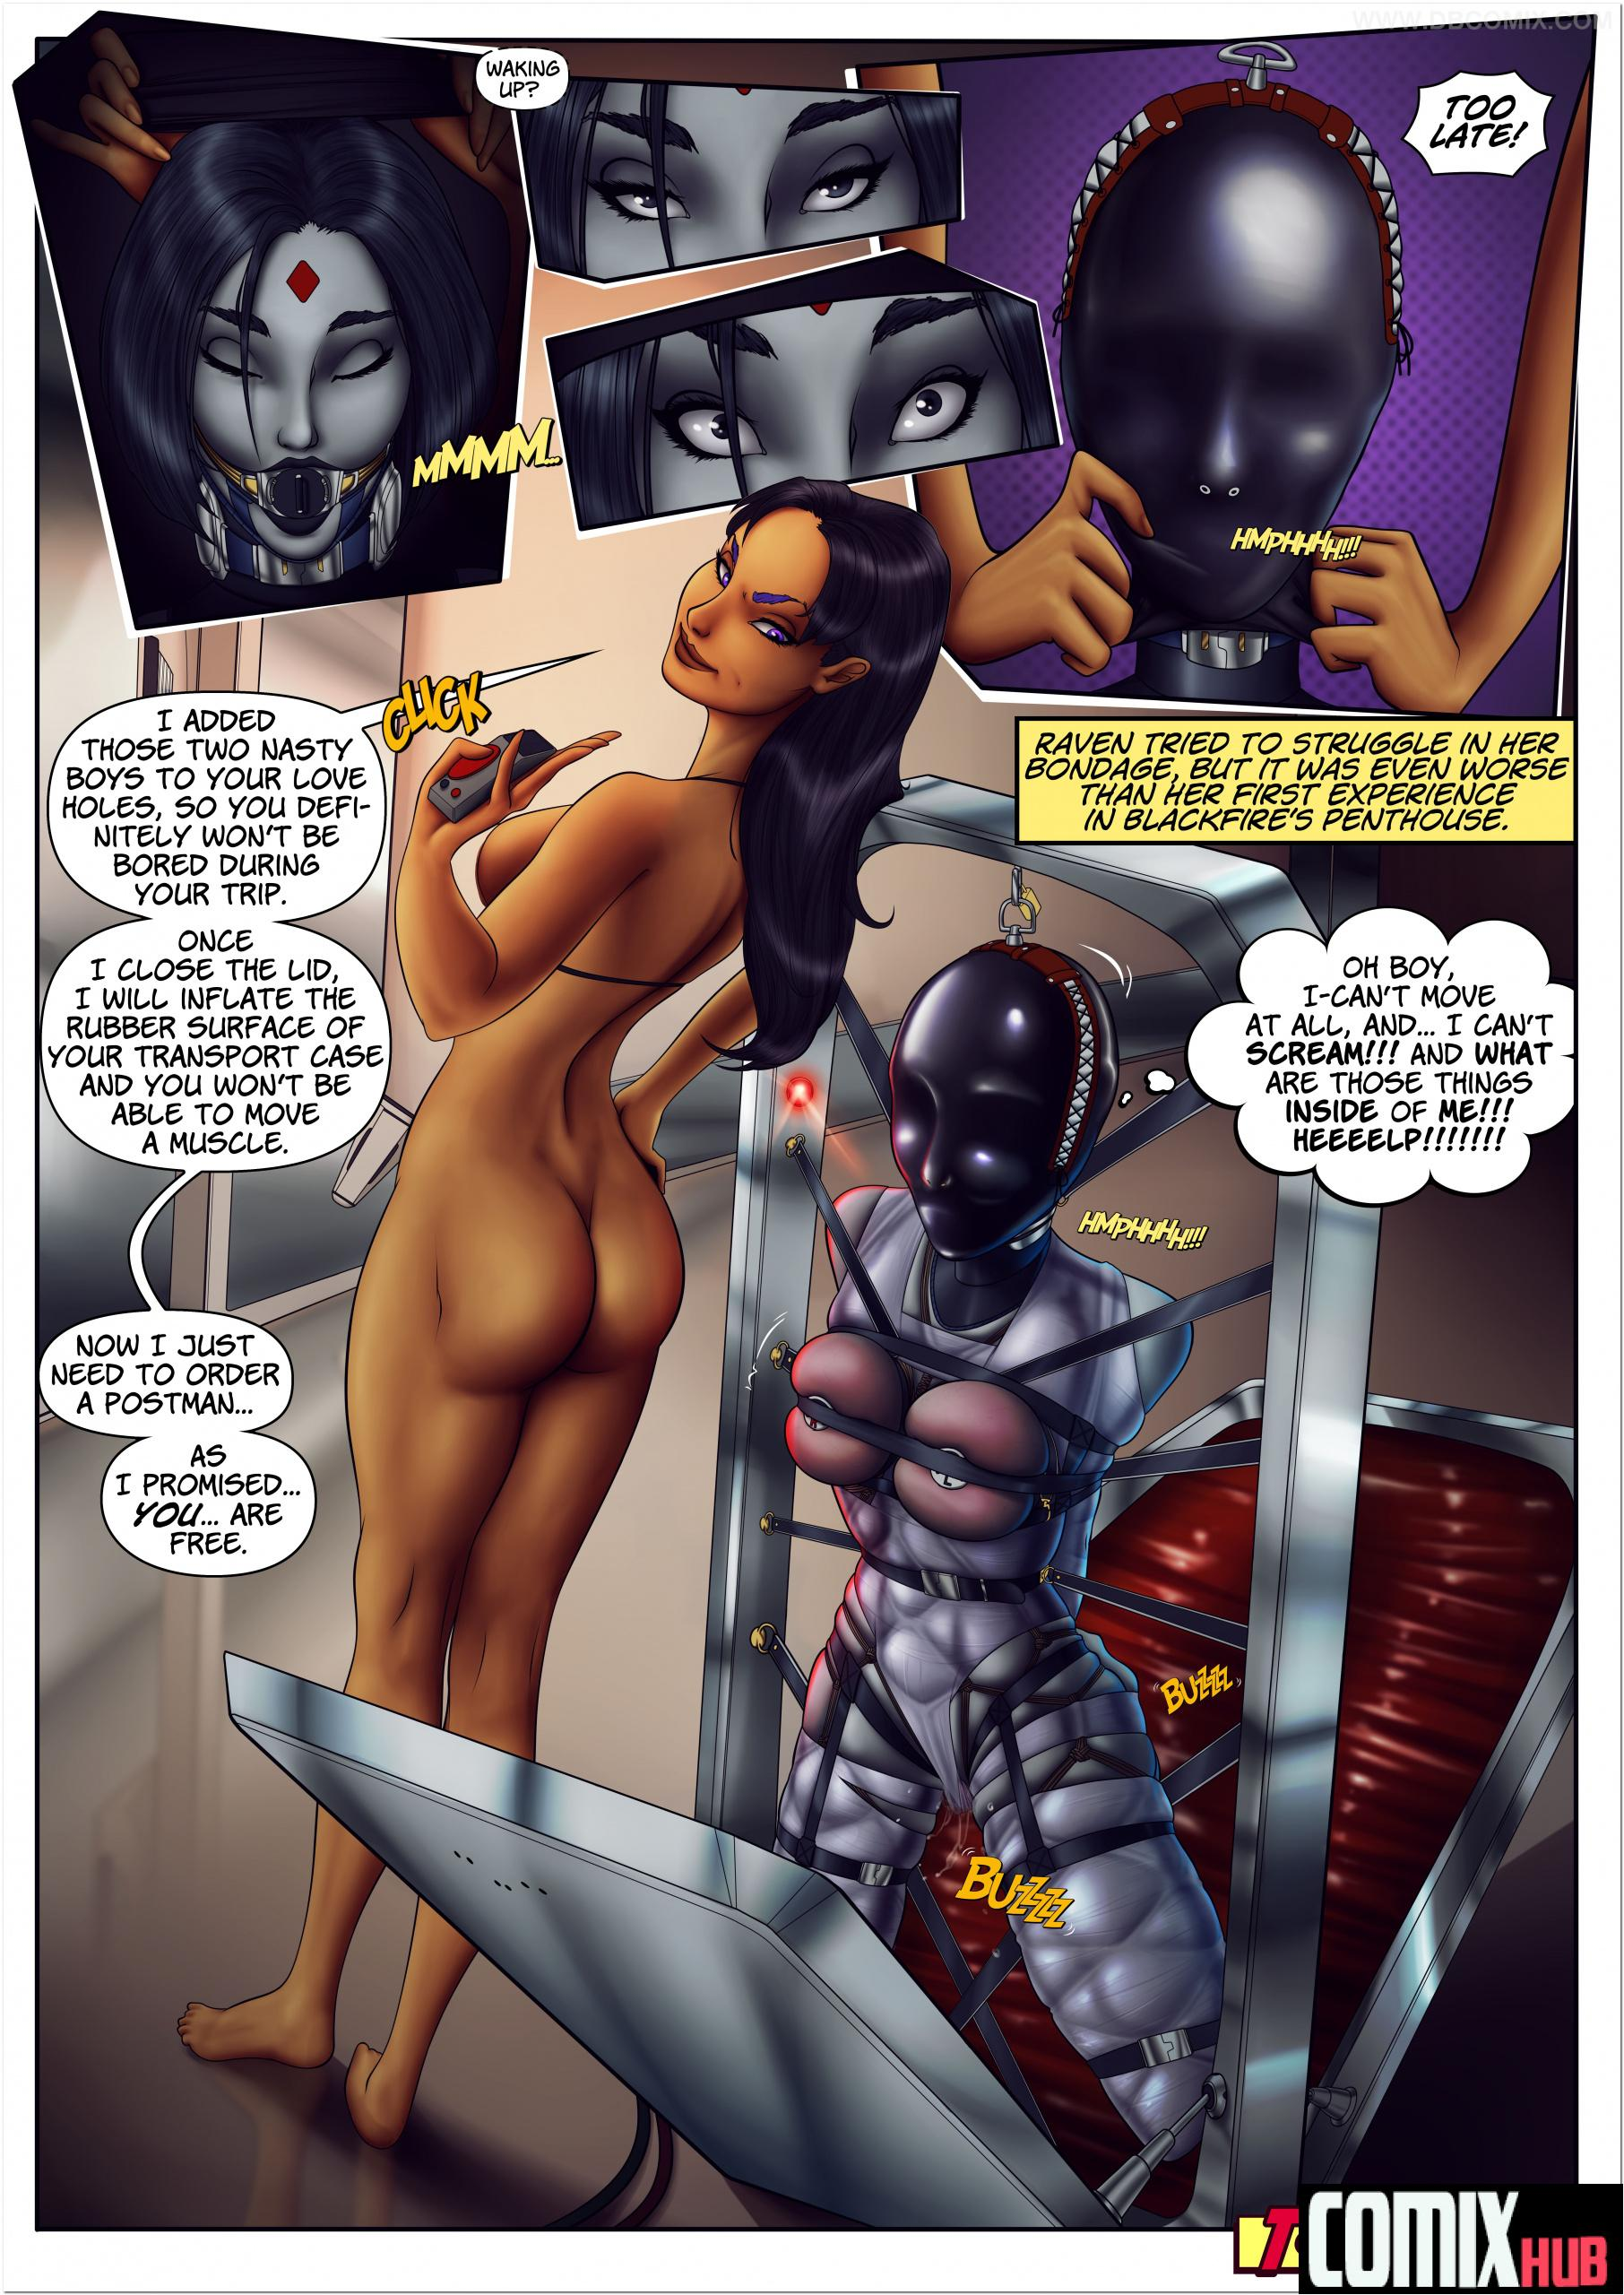 Porn comics, Teen Titans Raven Straight, BDSM, Big Tits, Bondage, Femdom, Latex, Lesbians, Sex Toys, Stockings, X-Ray